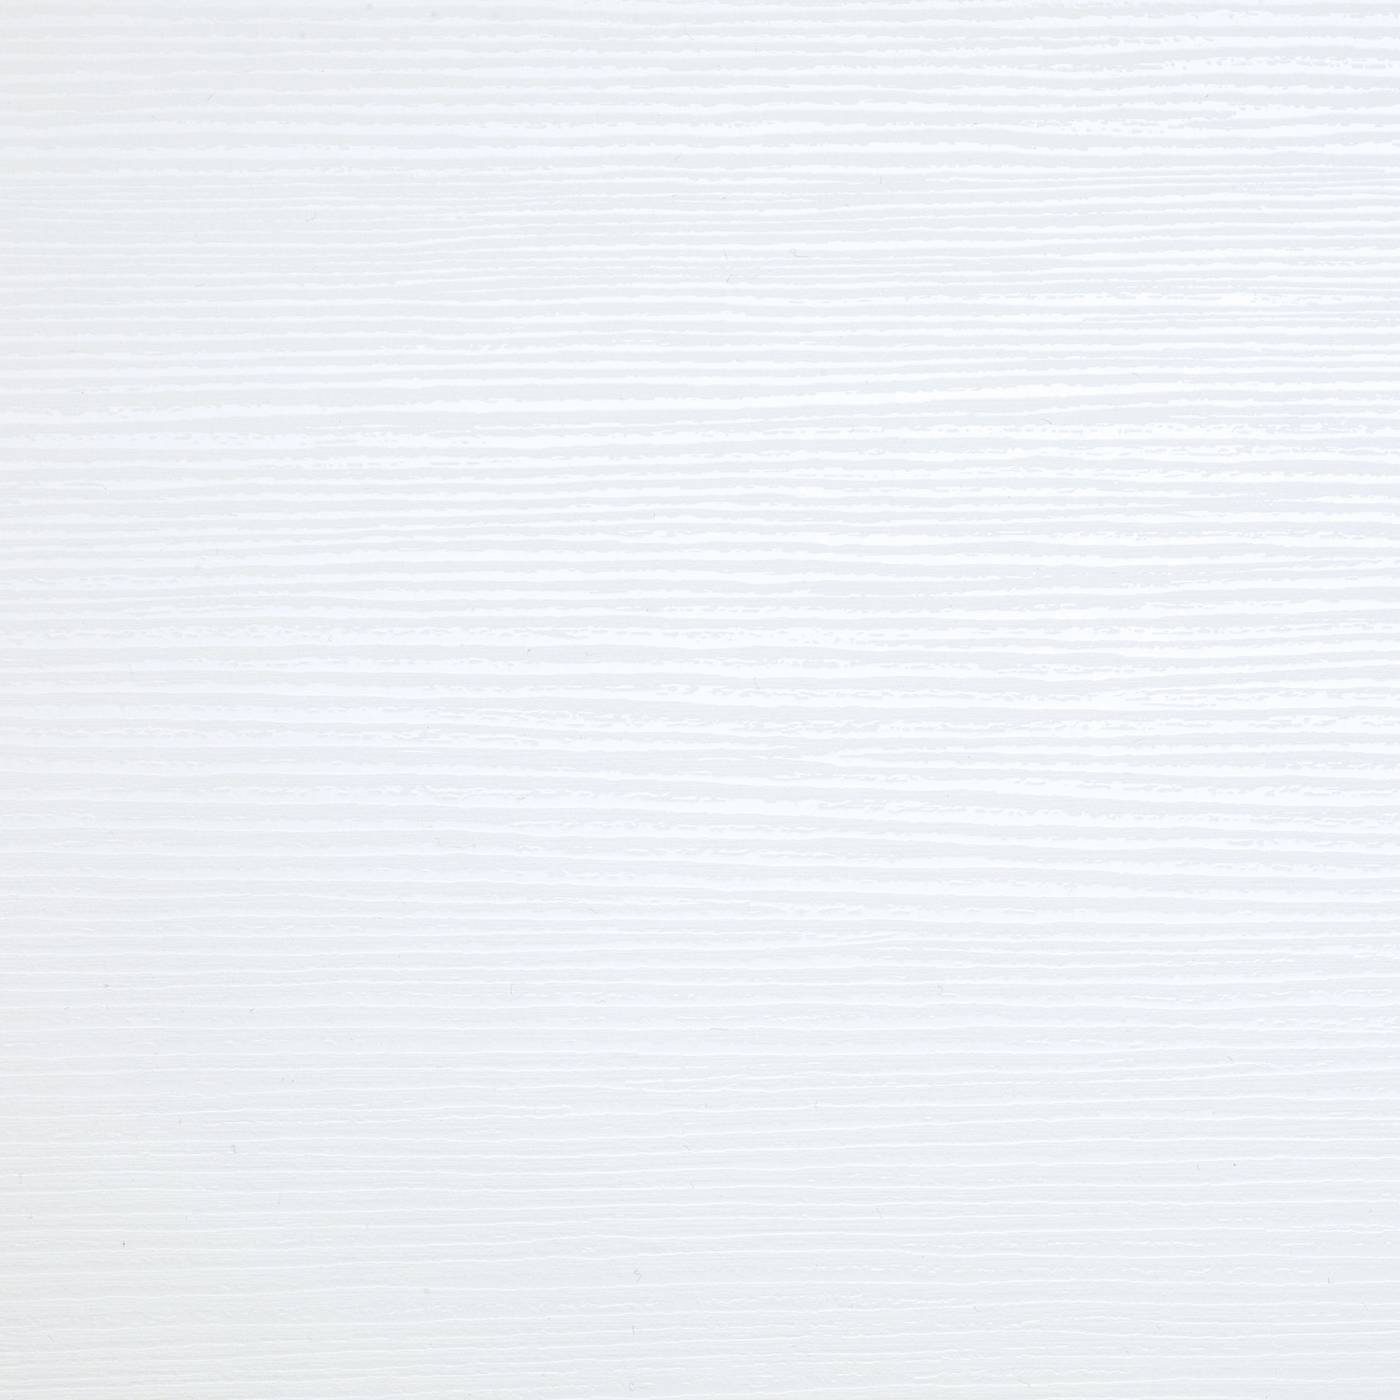 Mauerabdeckungen - Lottmann